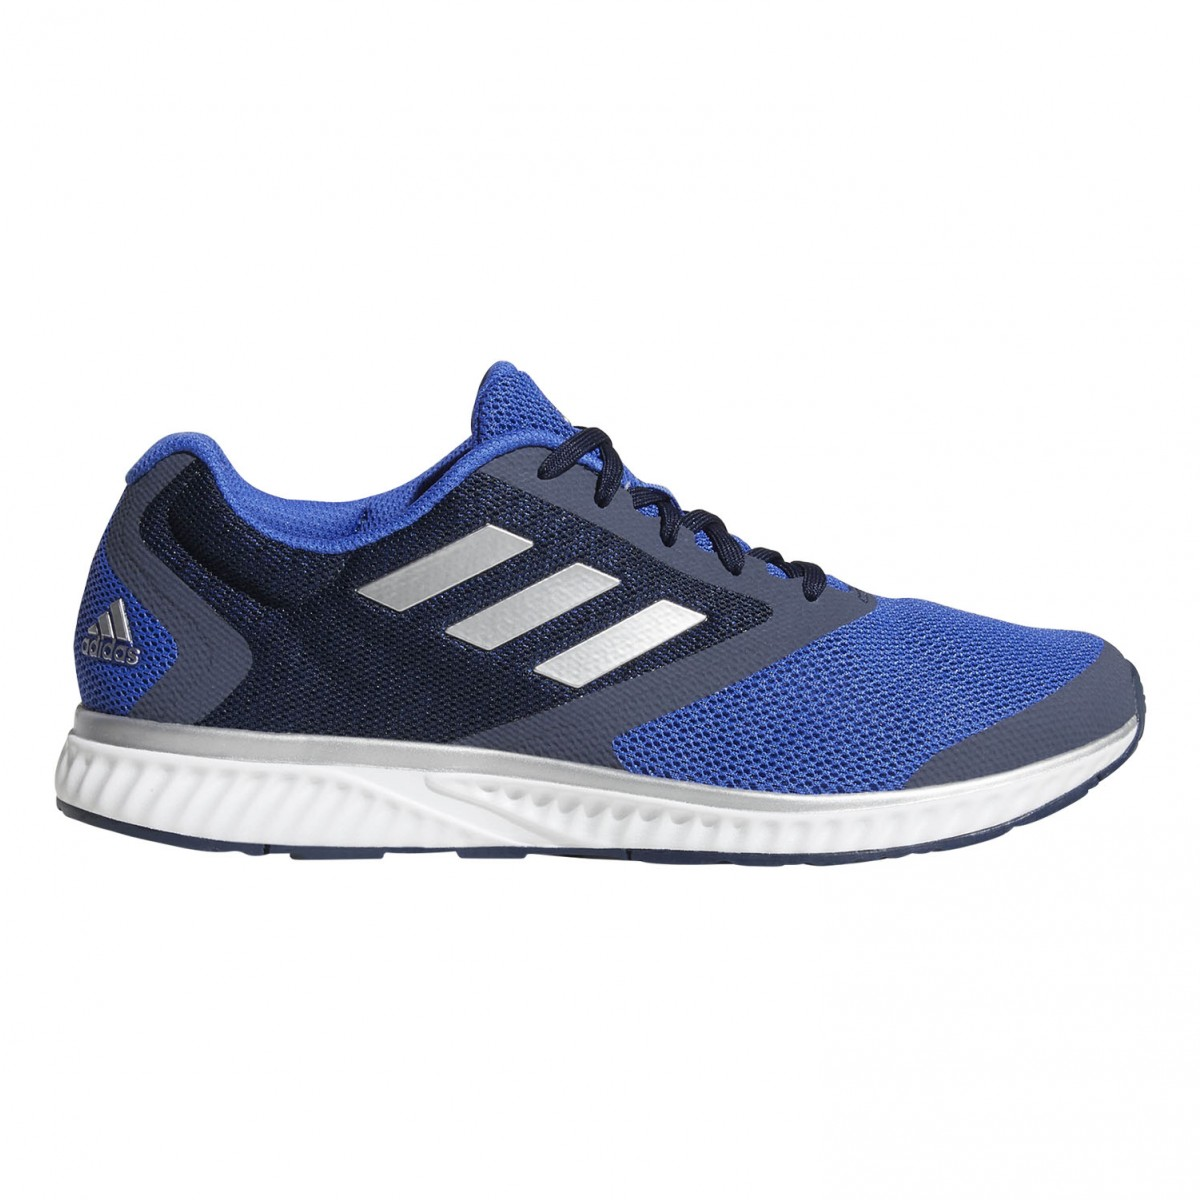 Zapatillas Adidas Edge Rc